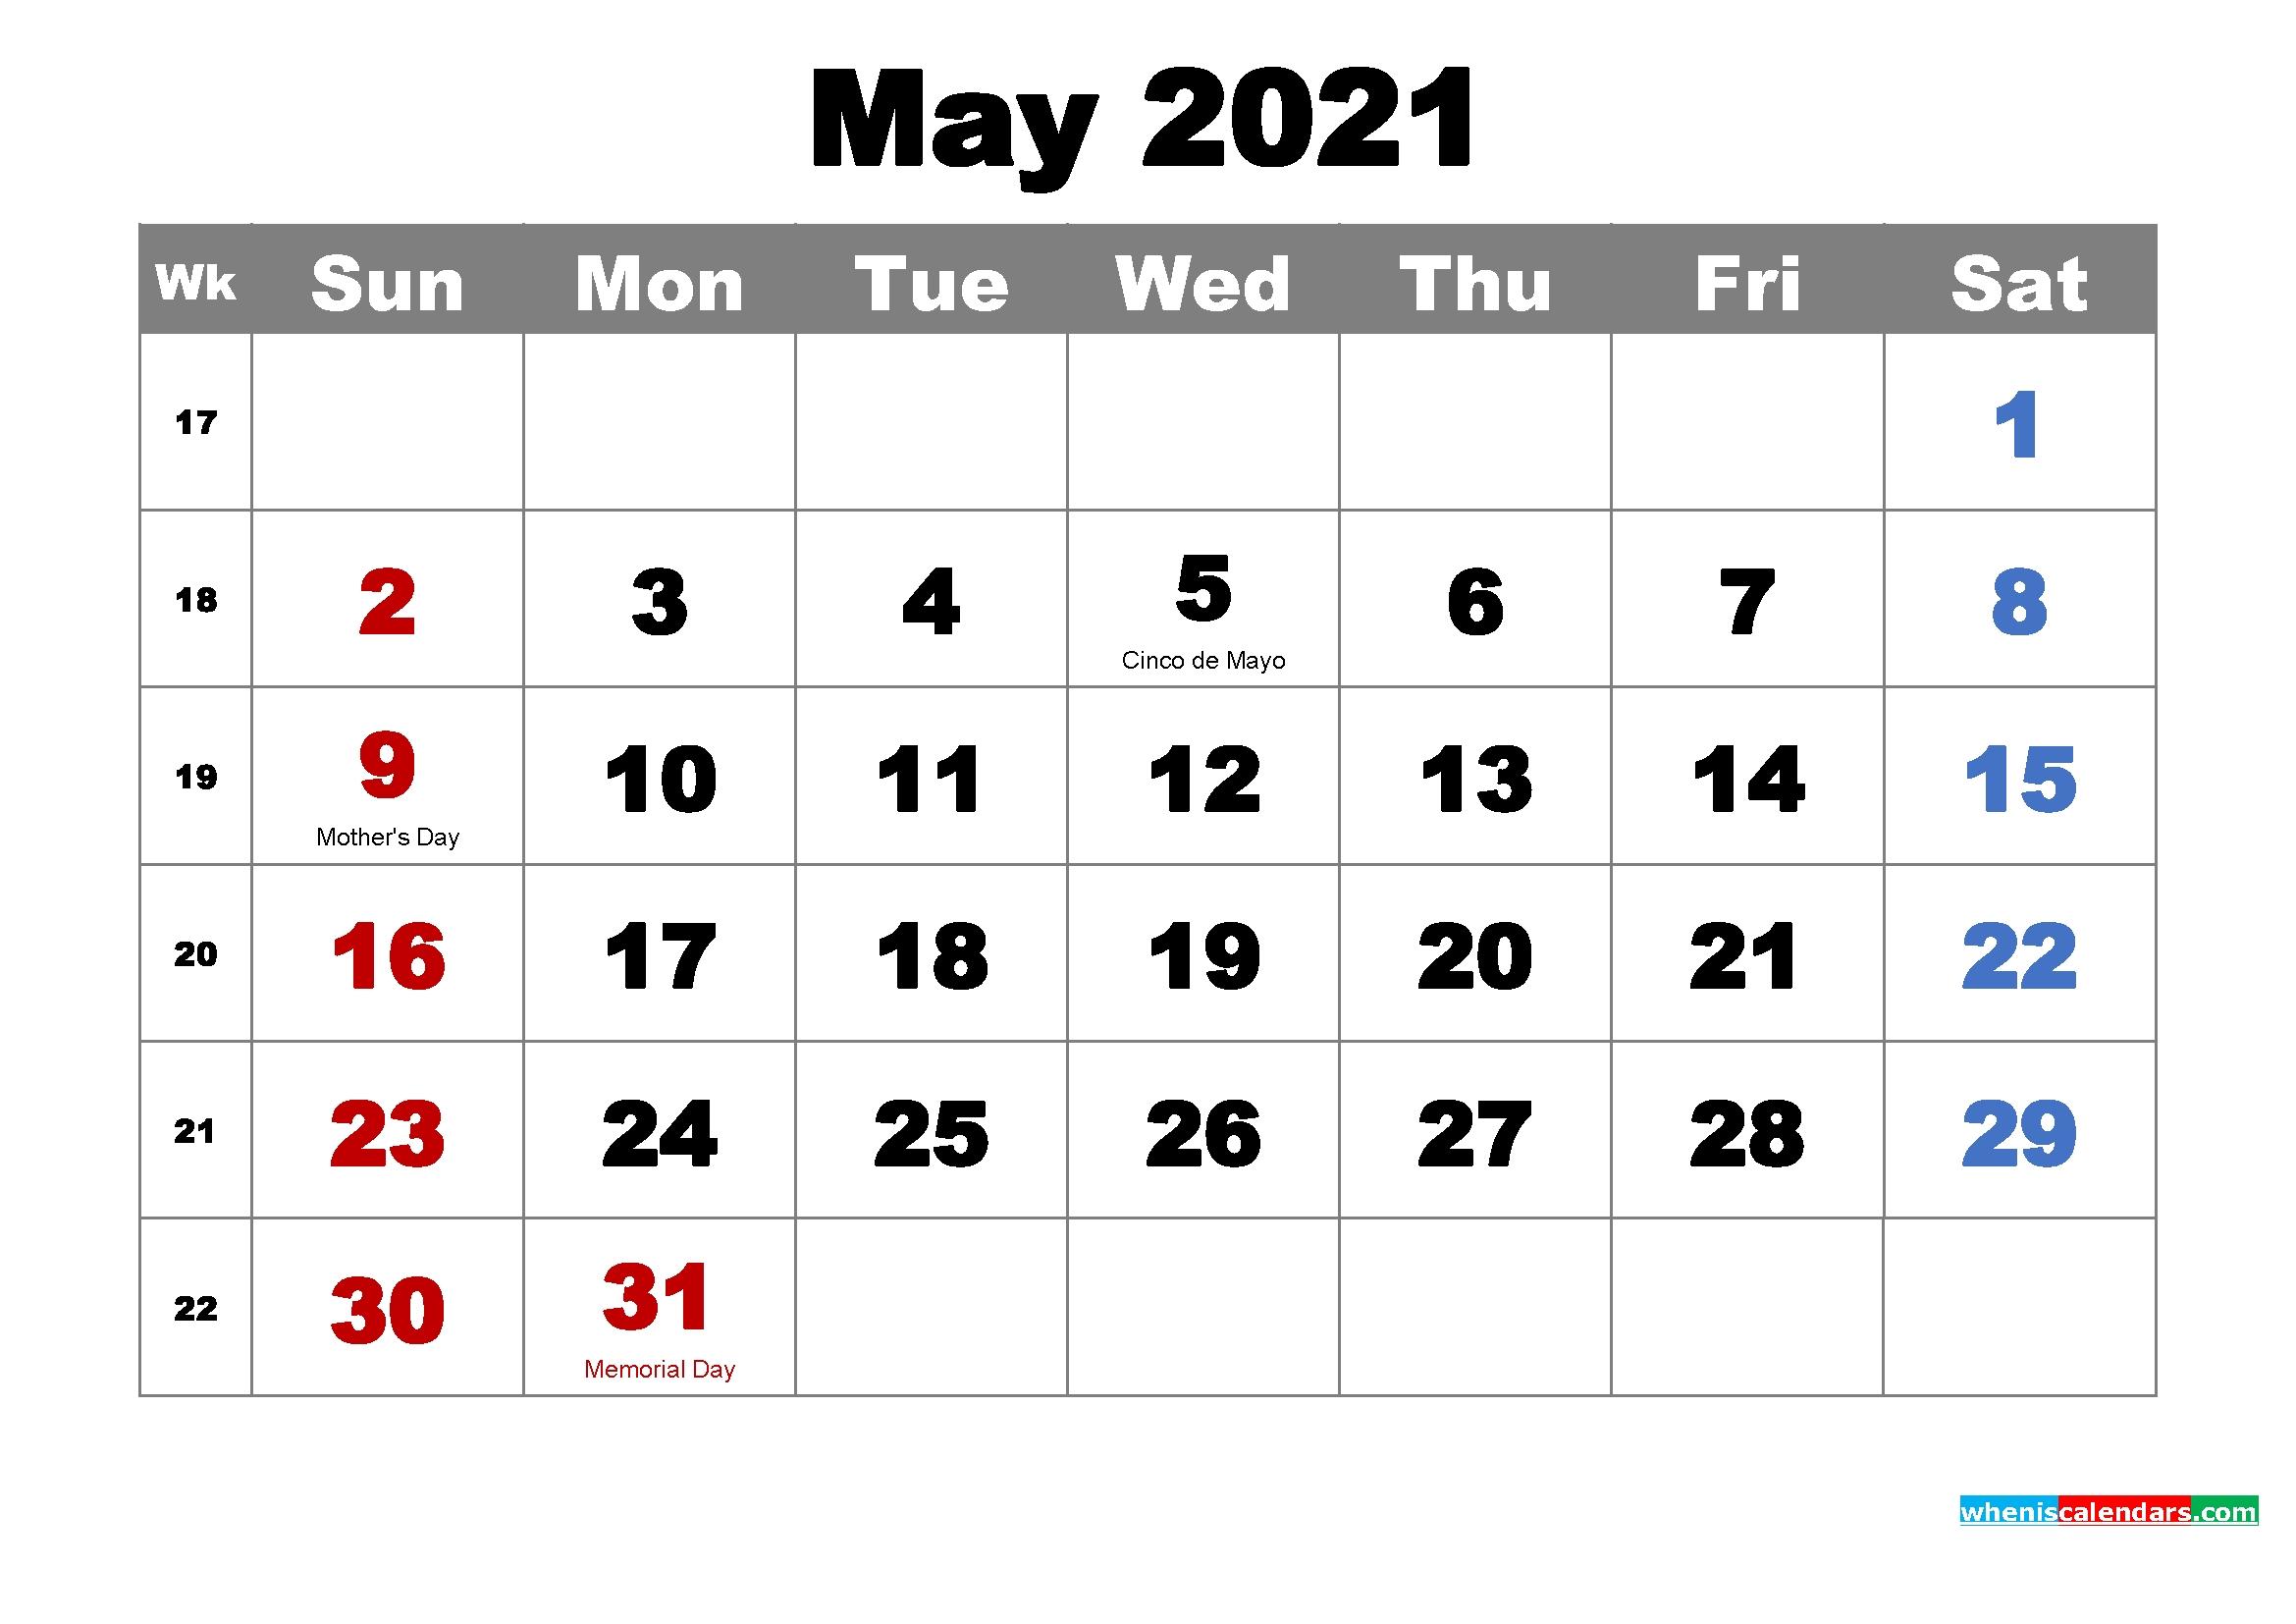 free printable may 2021 calendar with holidays as word, pdf